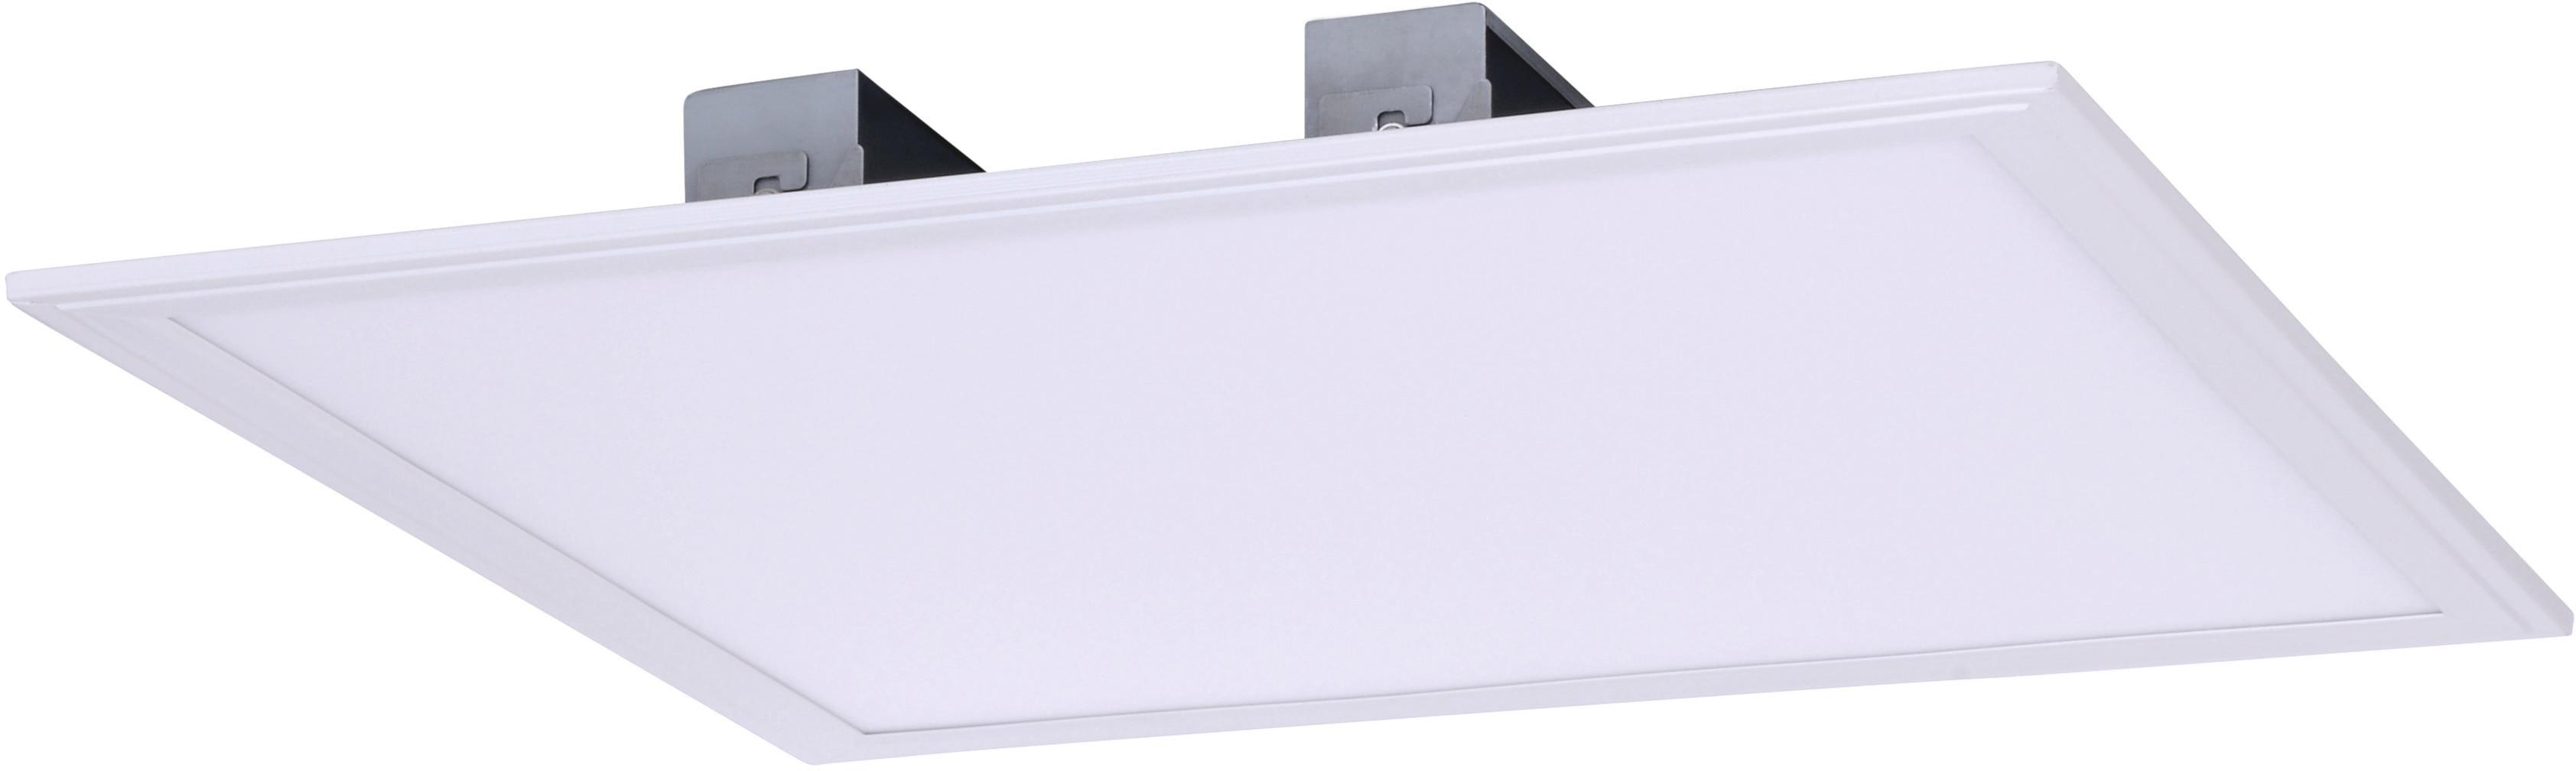 näve LED Panel PANEL, LED-Board, Neutralweiß, LED Deckenleuchte, LED Deckenlampe